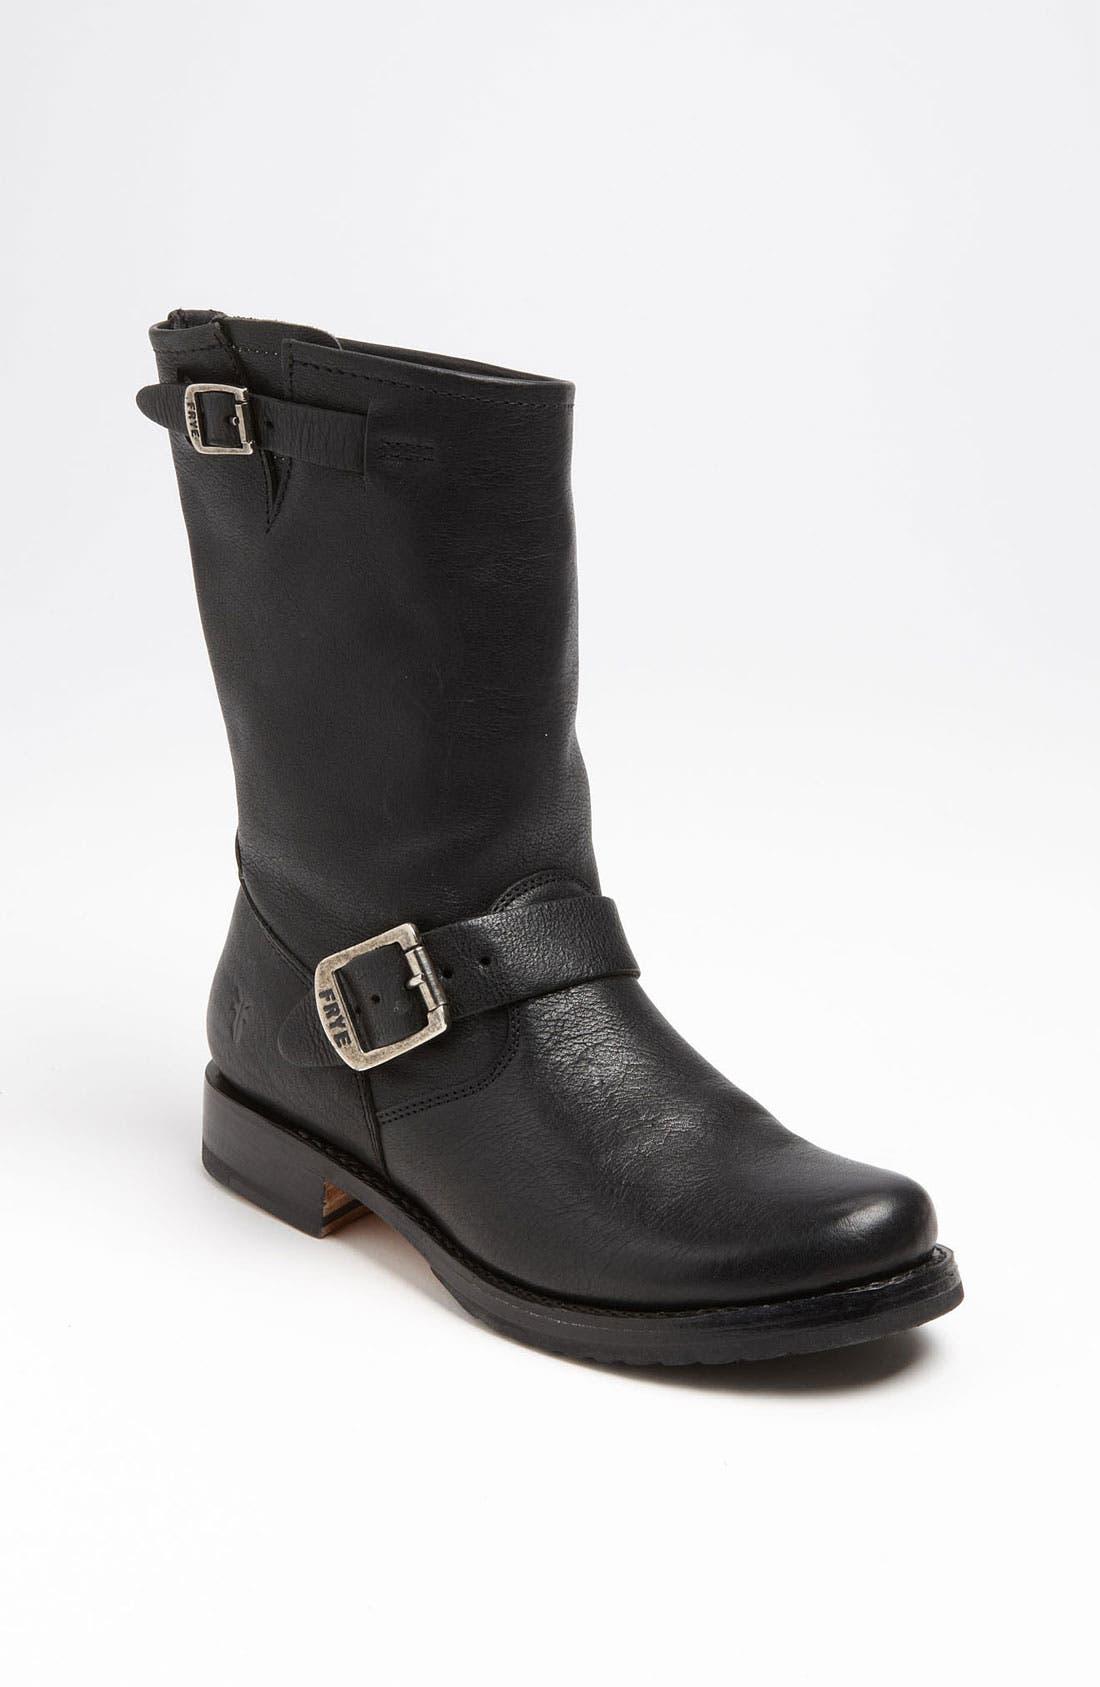 Alternate Image 1 Selected - Frye 'Veronica' Short Boot